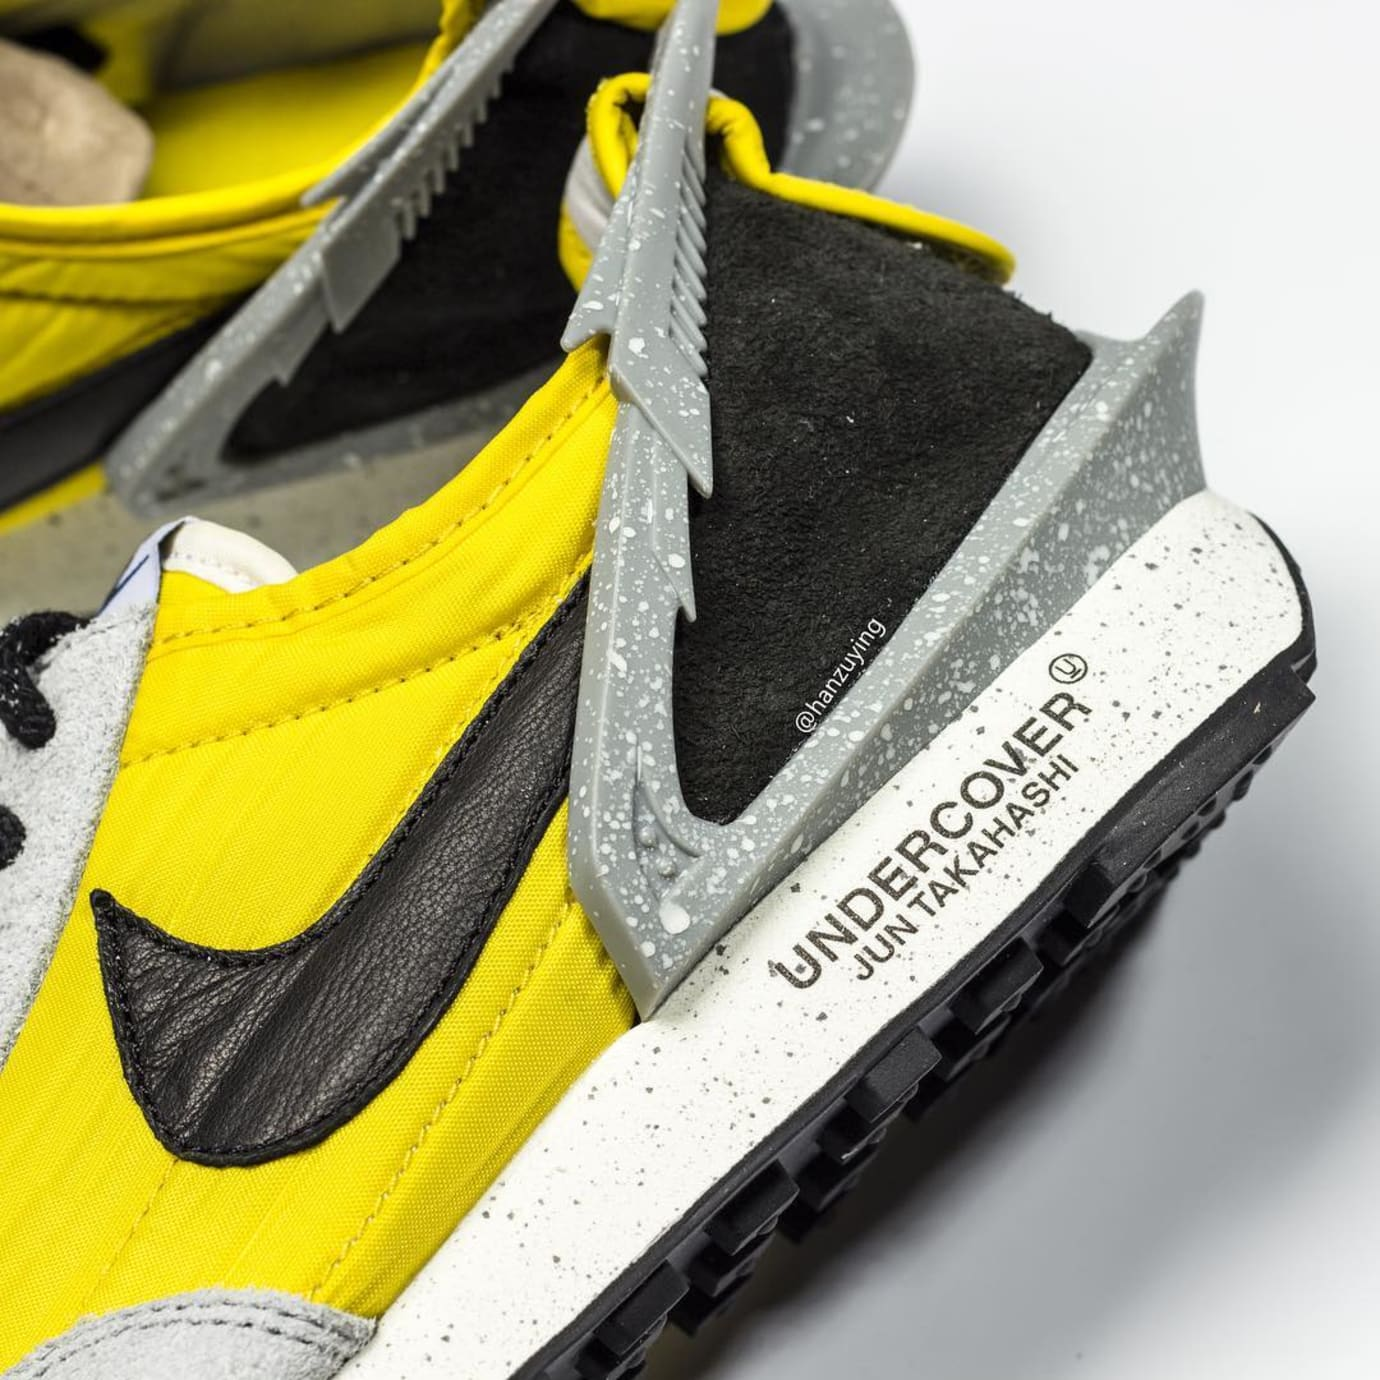 Undercover x Nike Daybreak Yellow/Grey BV4594-700 Heel